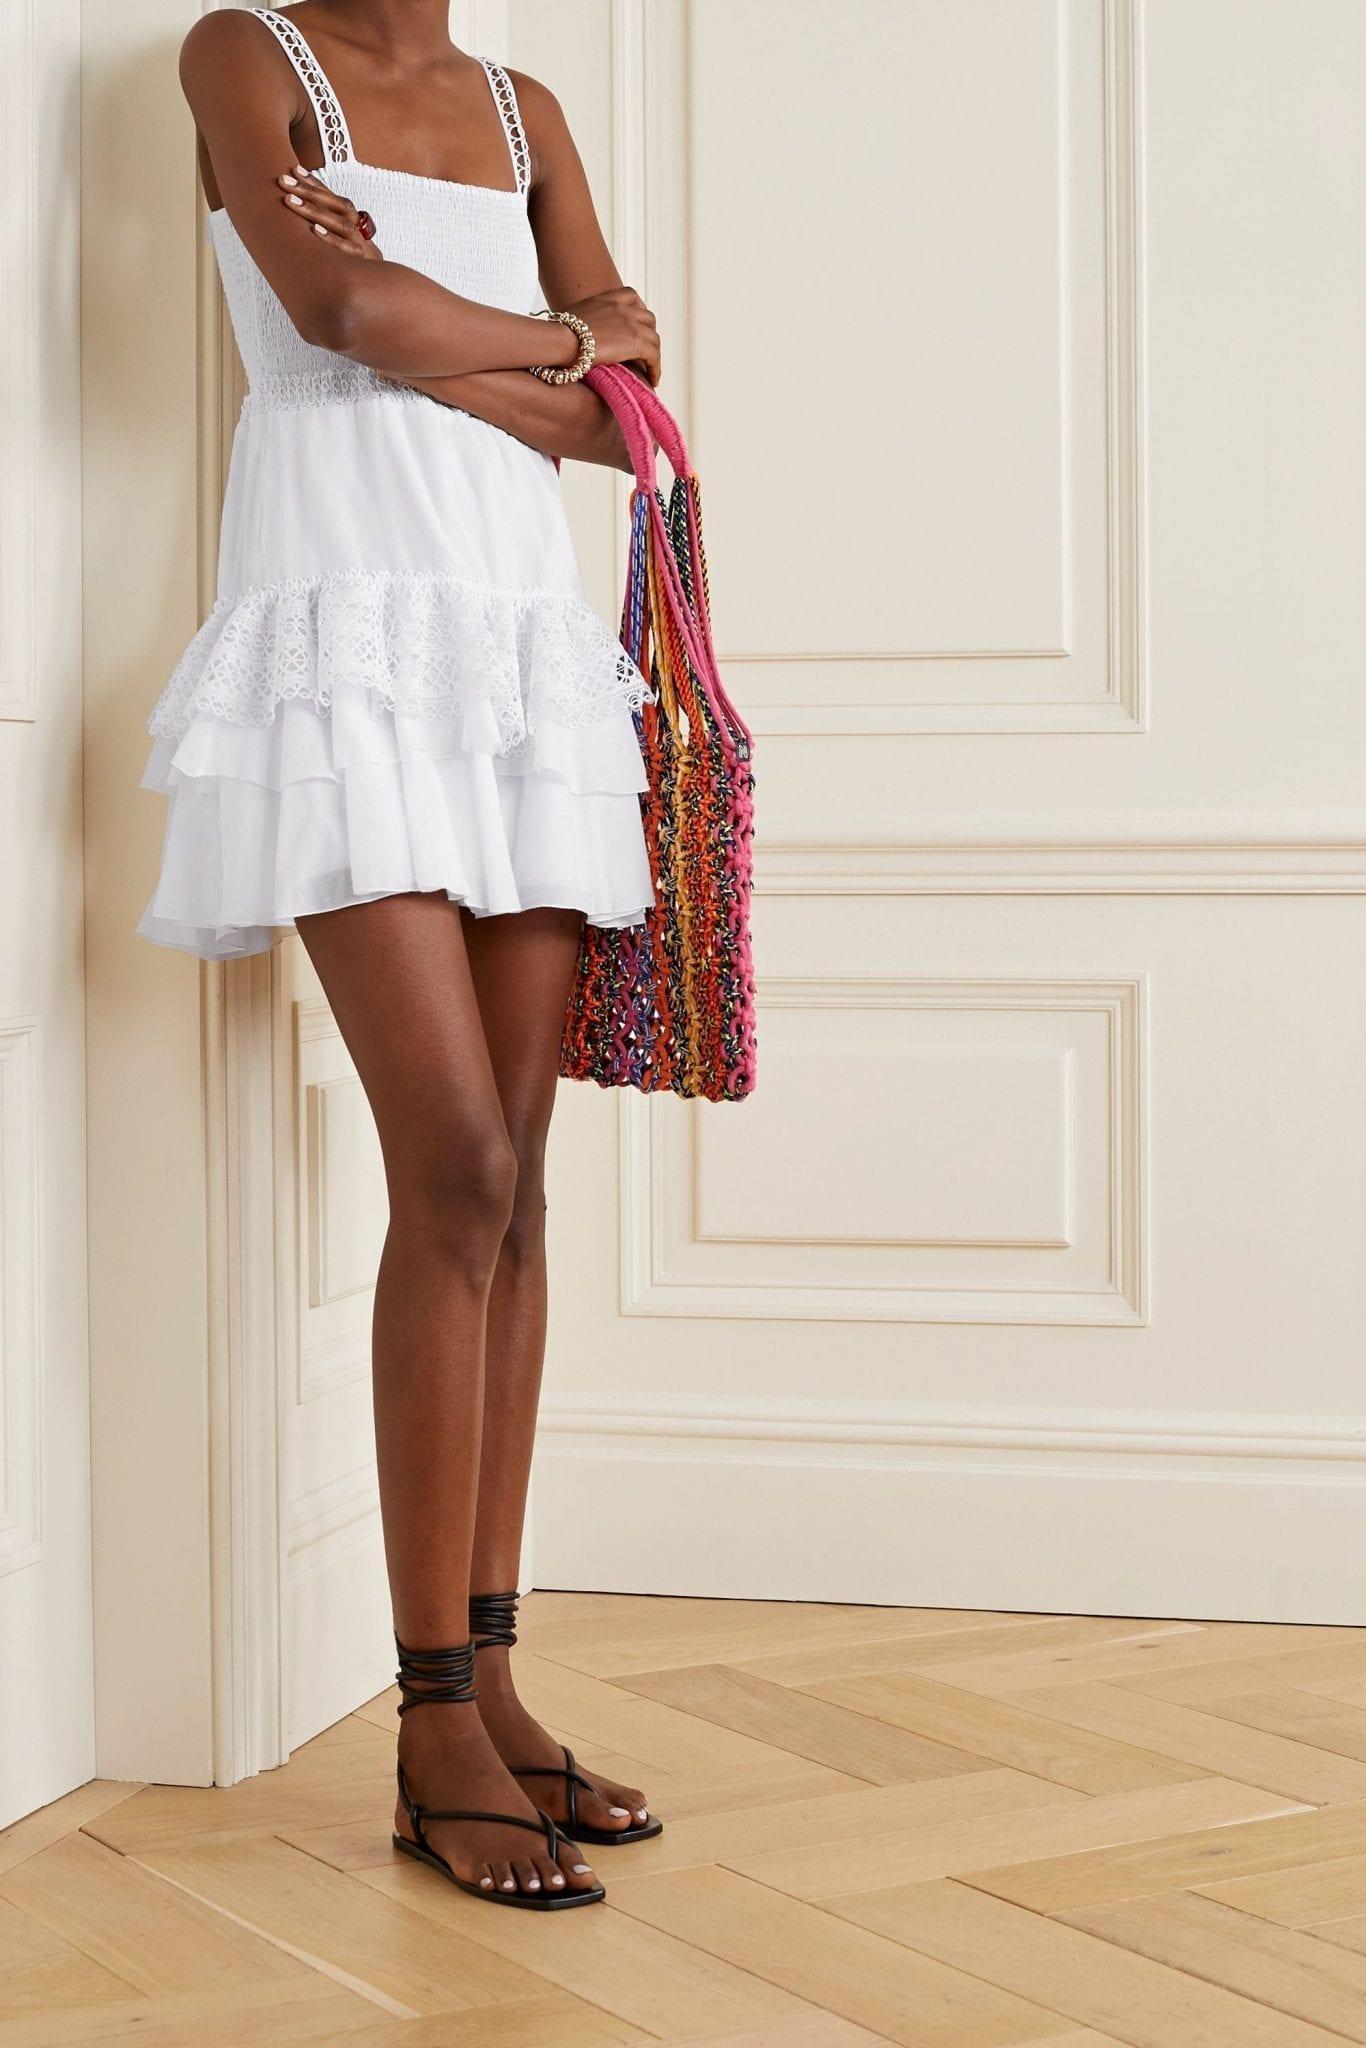 CHARO RUIZ Celina Crochet-trimmed Ruffled Cotton-blend Voile Mini Dress